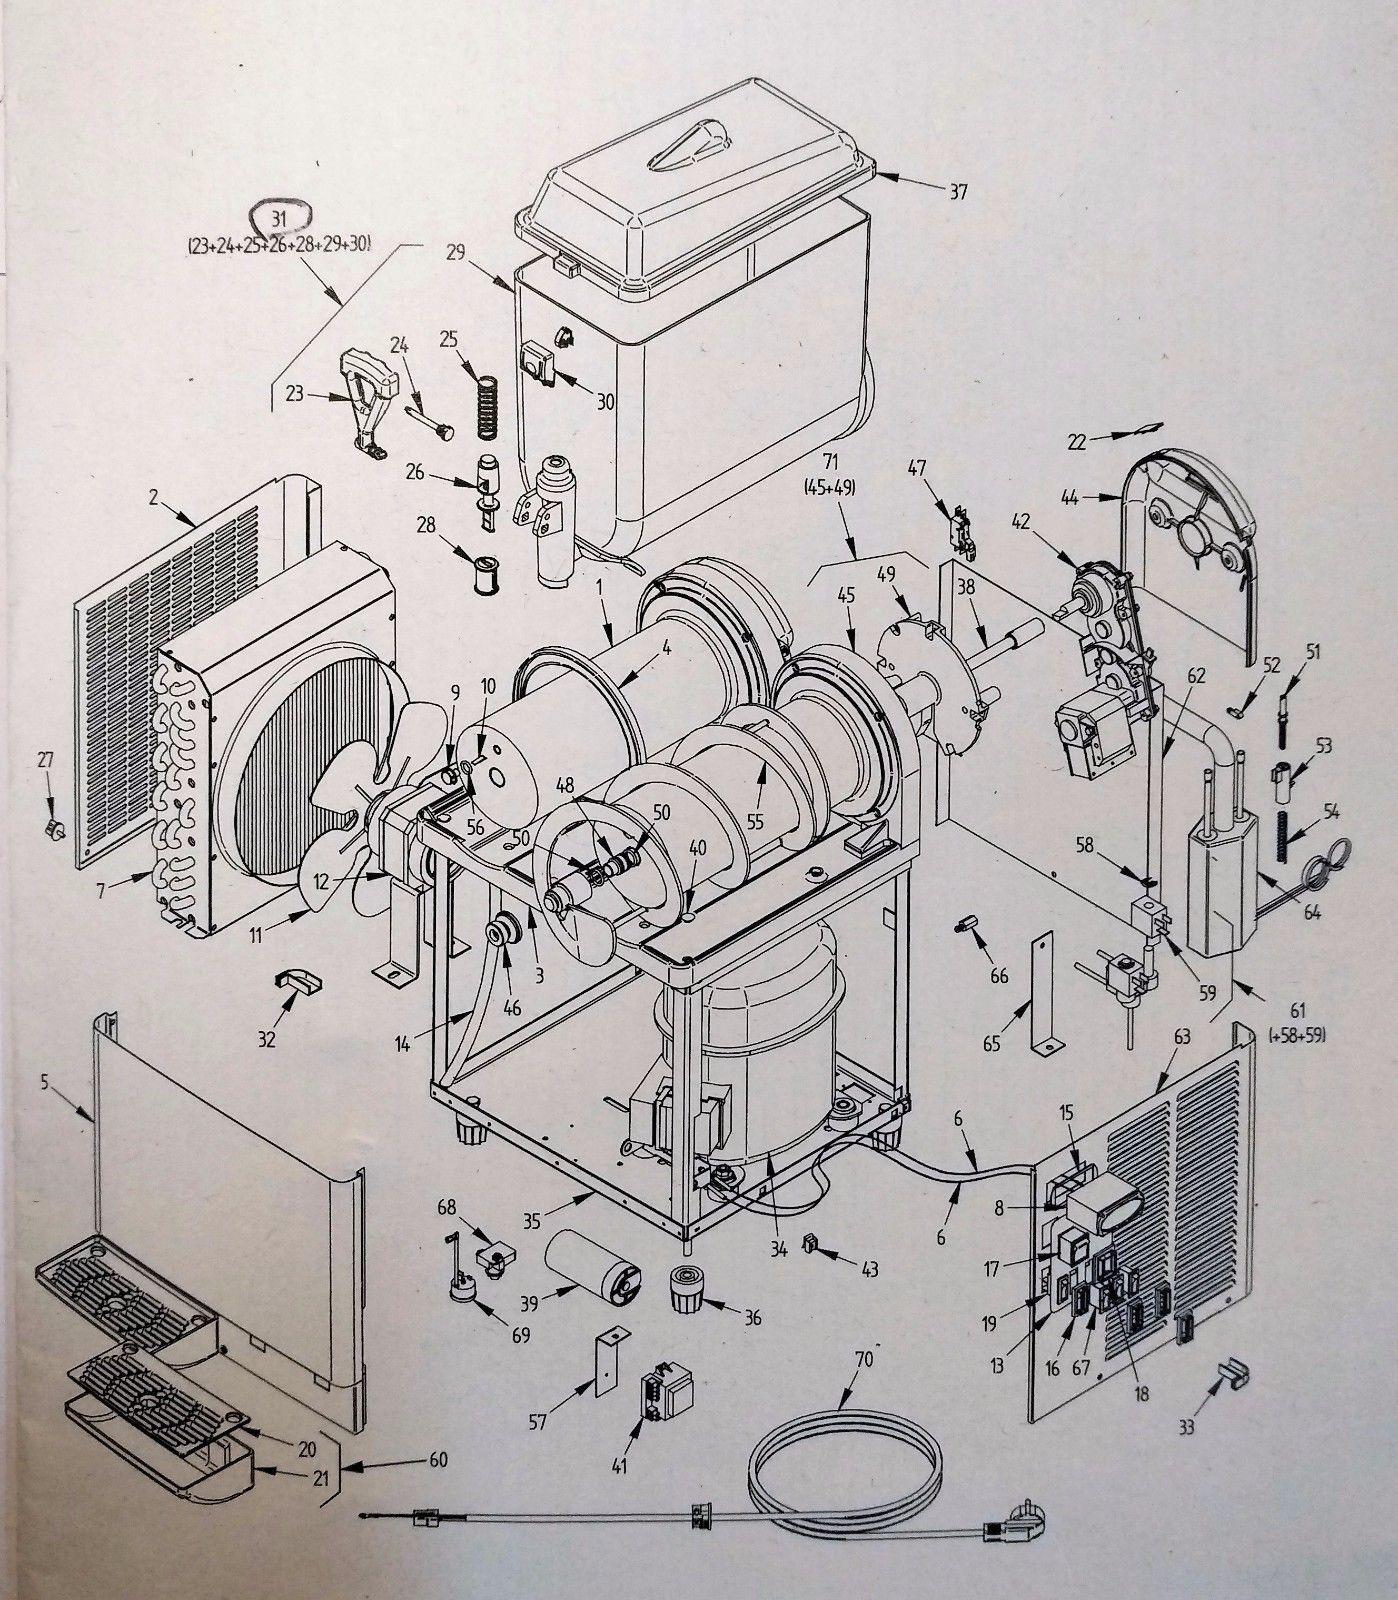 GBG GRANITIME Slush Machine Parts for sale online   eBay on